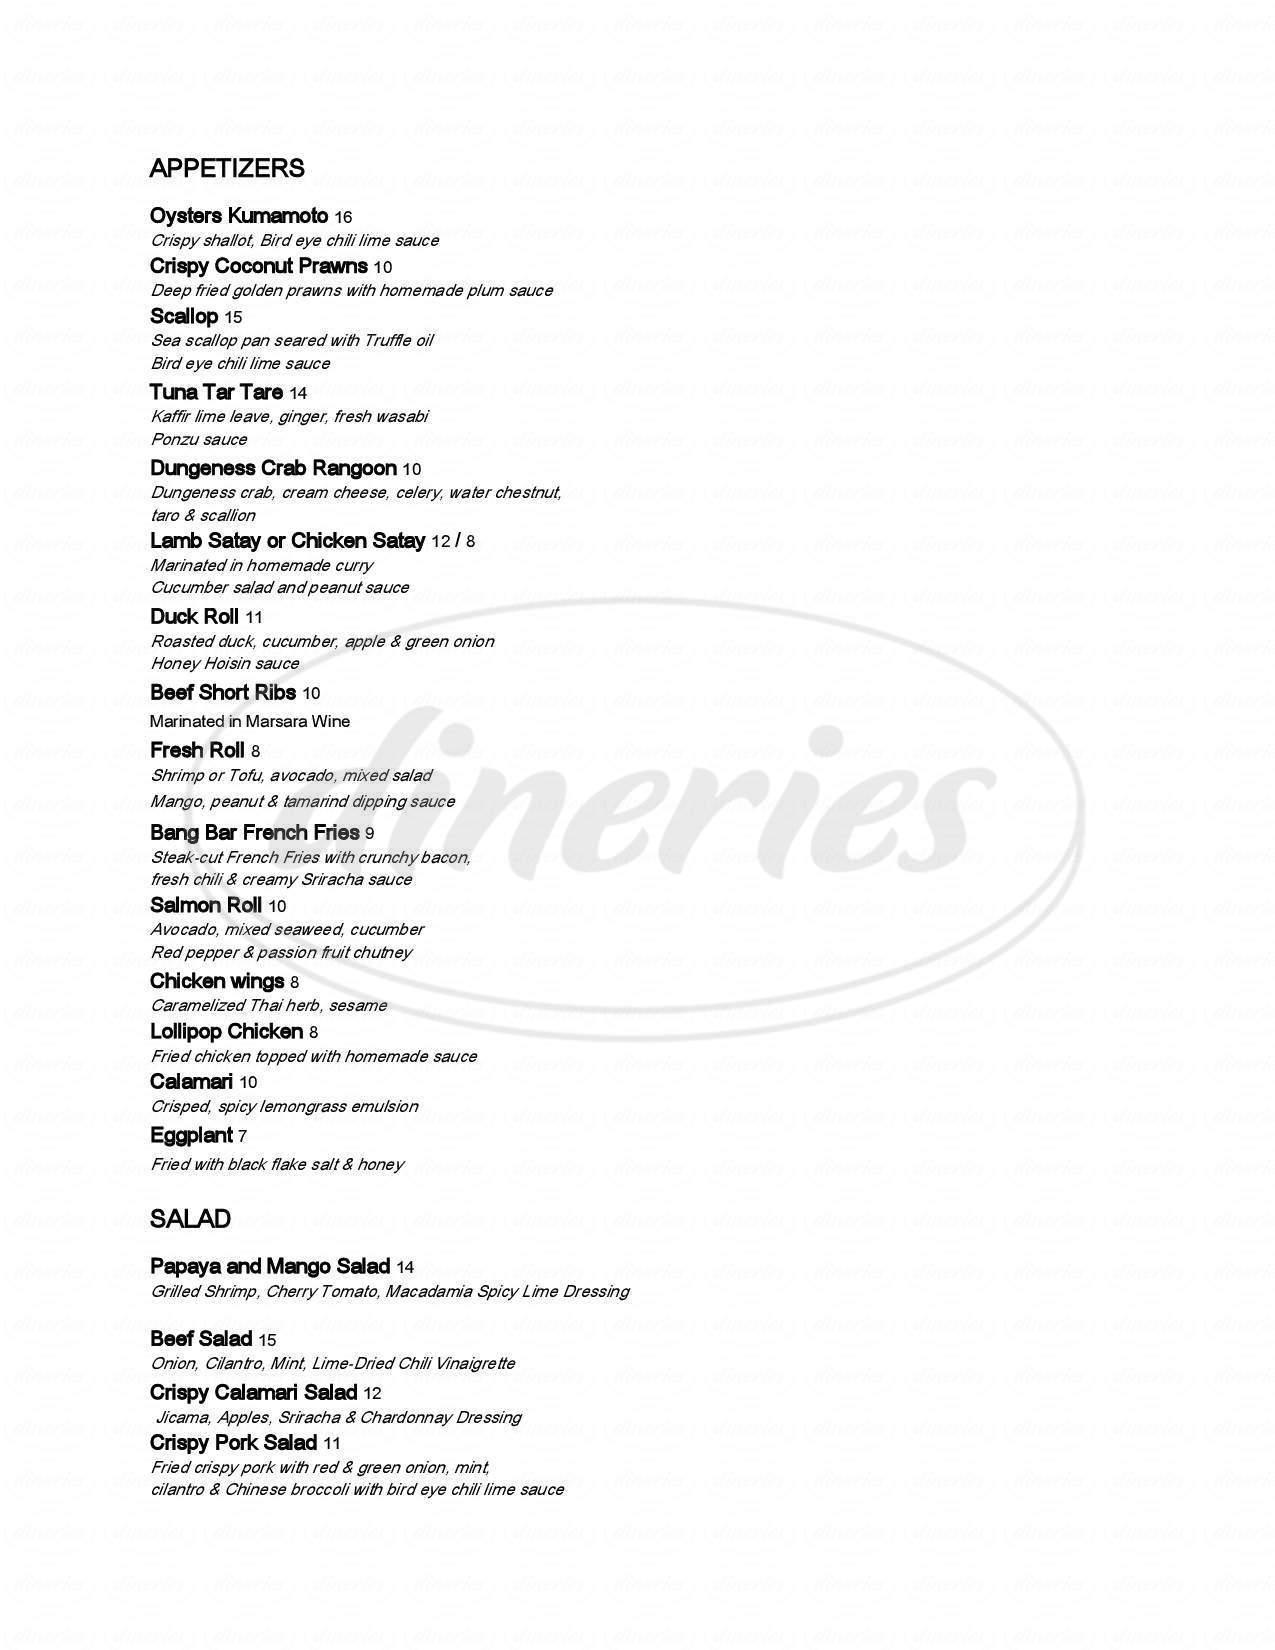 menu for Bang Bar Thai Restaurant and Lounge